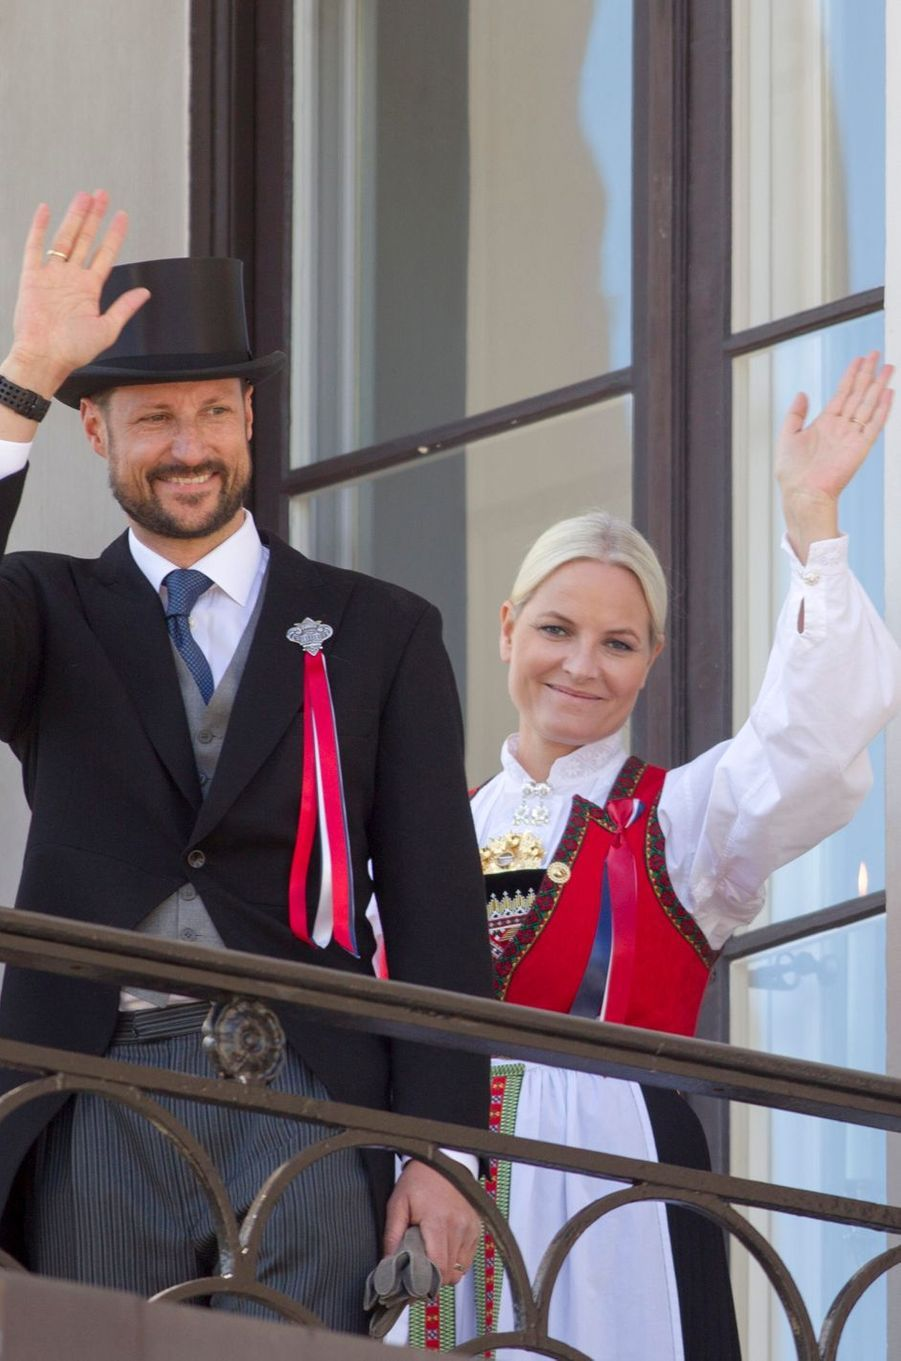 La princesse Mette-Marit et le prince Haakon de Norvège à Oslo, le 17 mai 2016